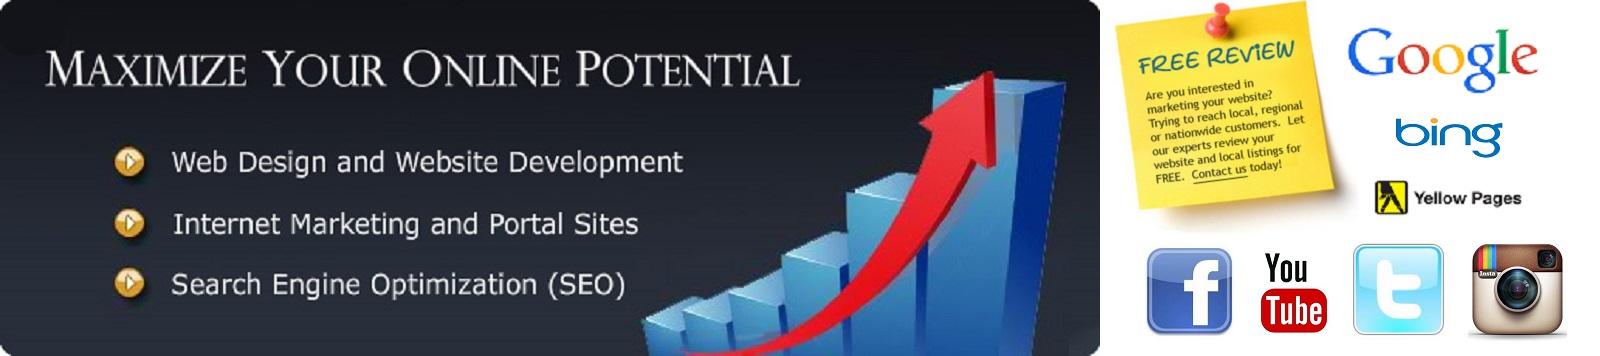 Online Marketing | Internet Marketing | IYPS